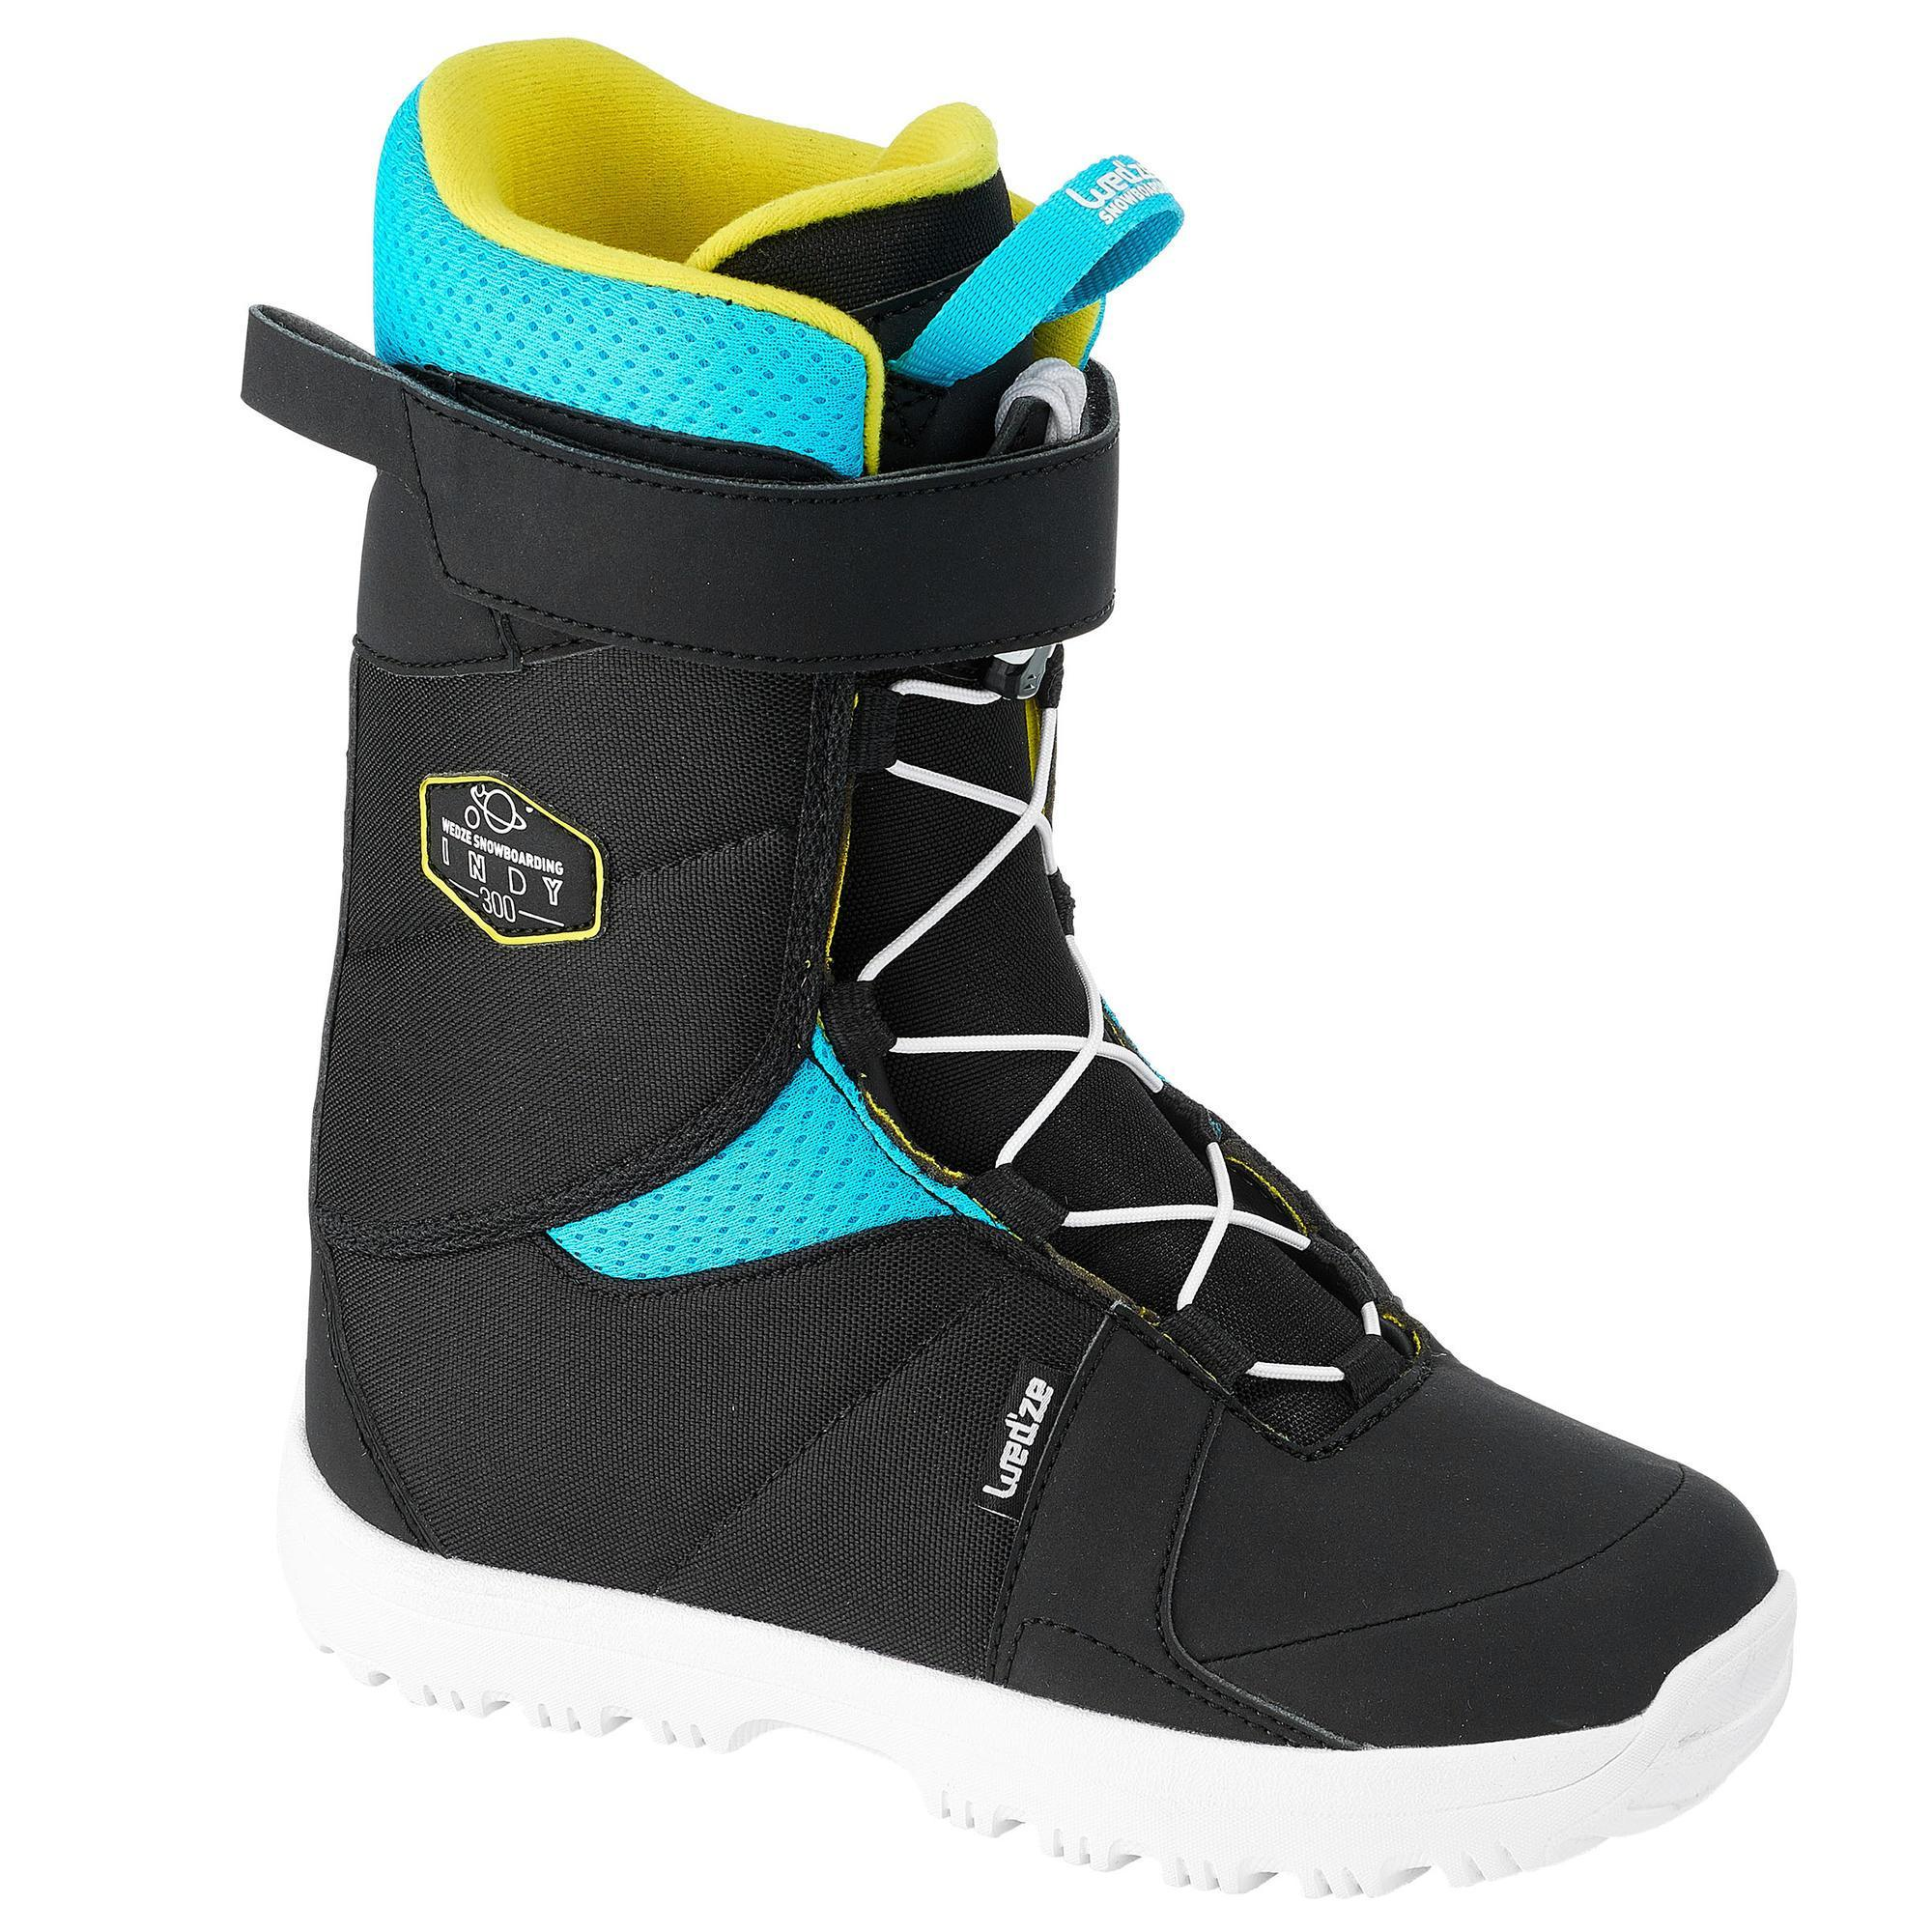 Jungen,Kinder,Kinder Snowboardschuhe Fast Lock 2Z Indy 300 Kinder (Größen:34-38)blau gelb | 03608449879576